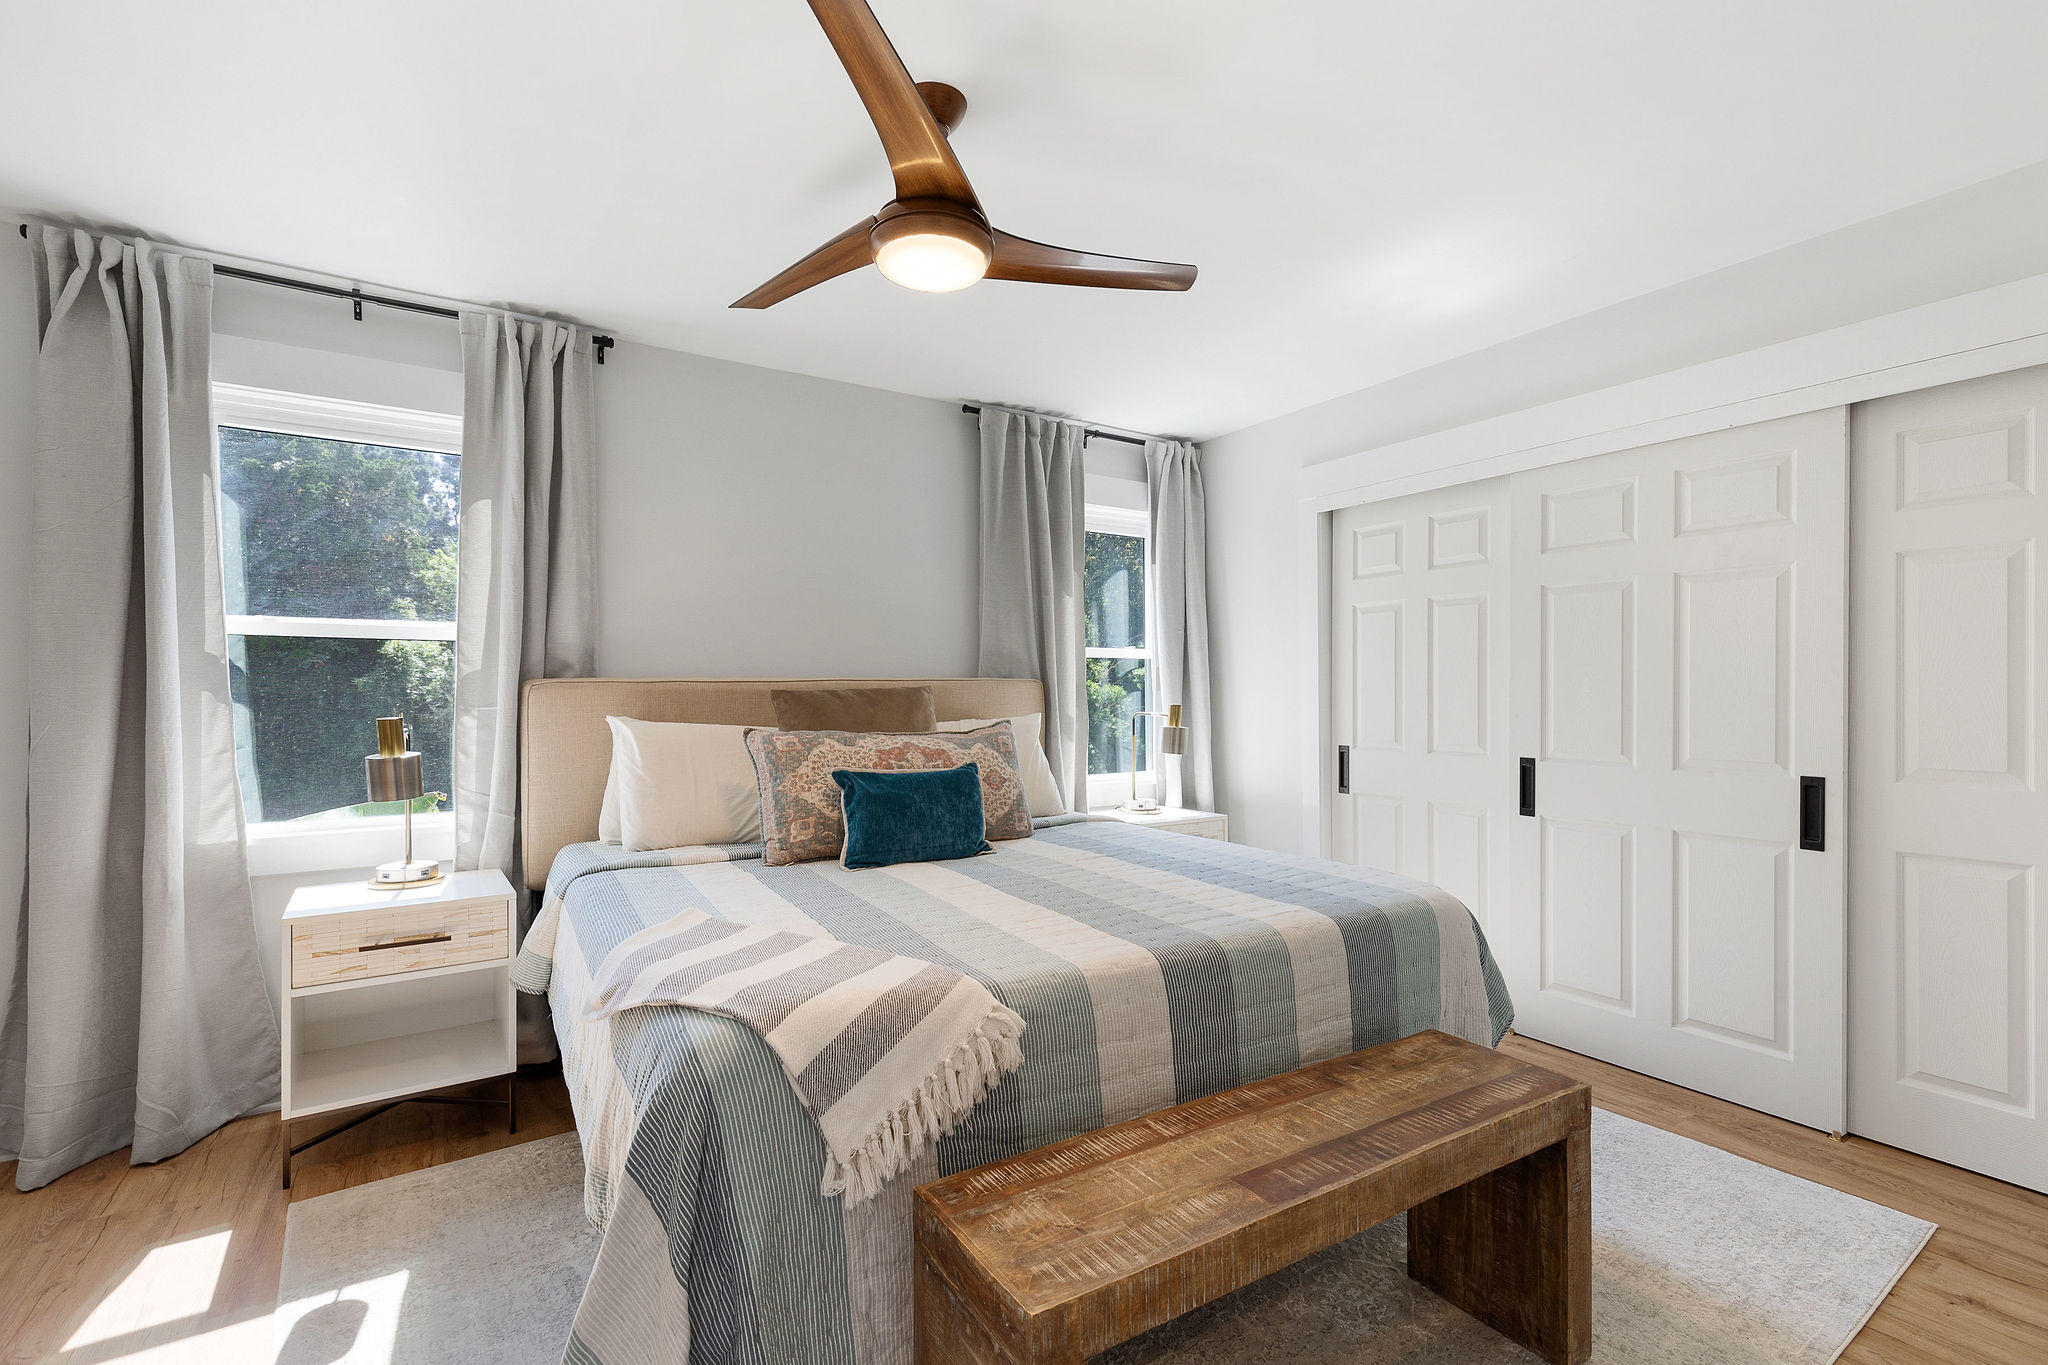 Proprietors Row Homes For Sale - 824 Colony, Charleston, SC - 3